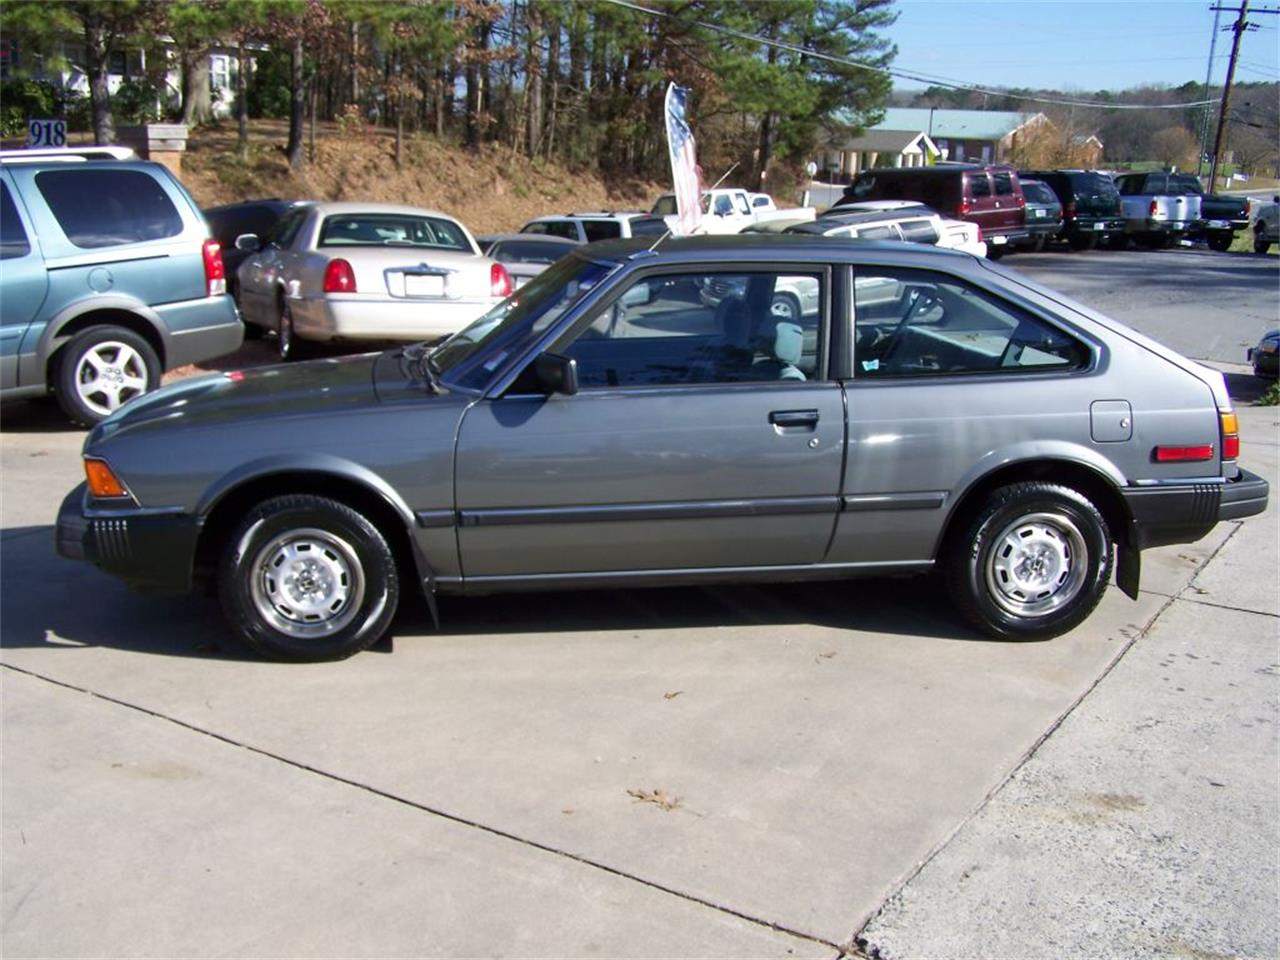 1983 Honda Accord LX Hatchback for Sale | ClassicCars.com ...